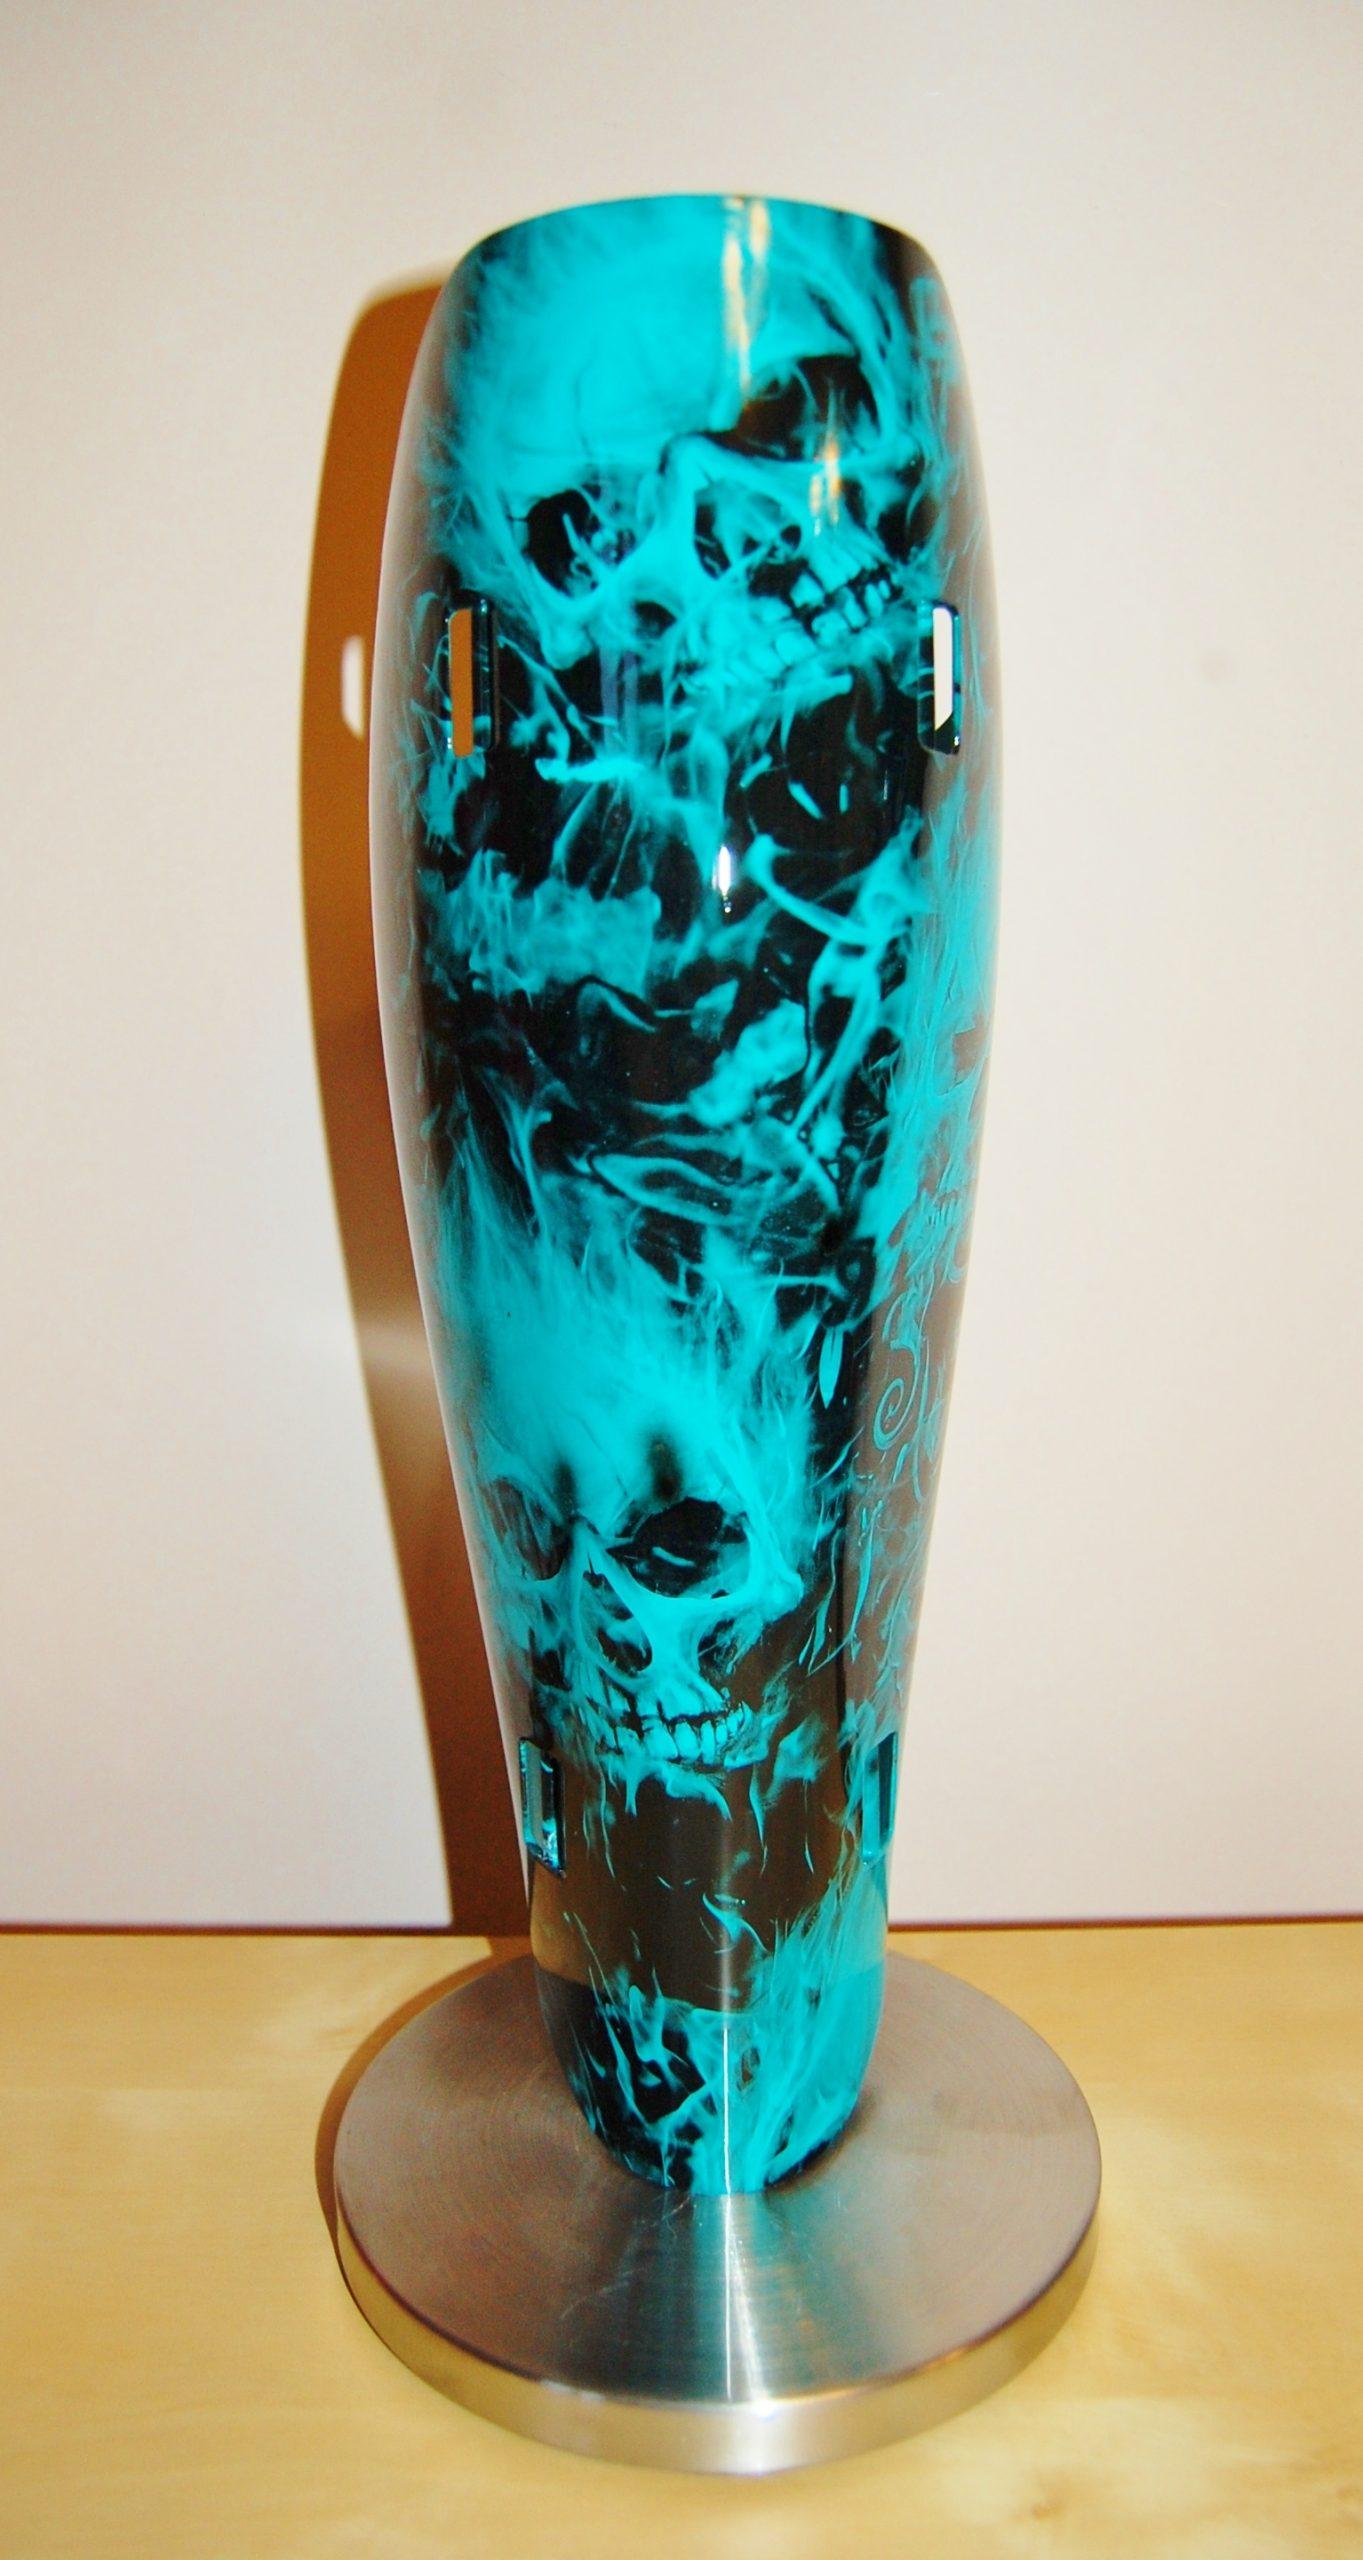 Core Custom Limb-art Teal Painted and Skull Flames Hydrodip